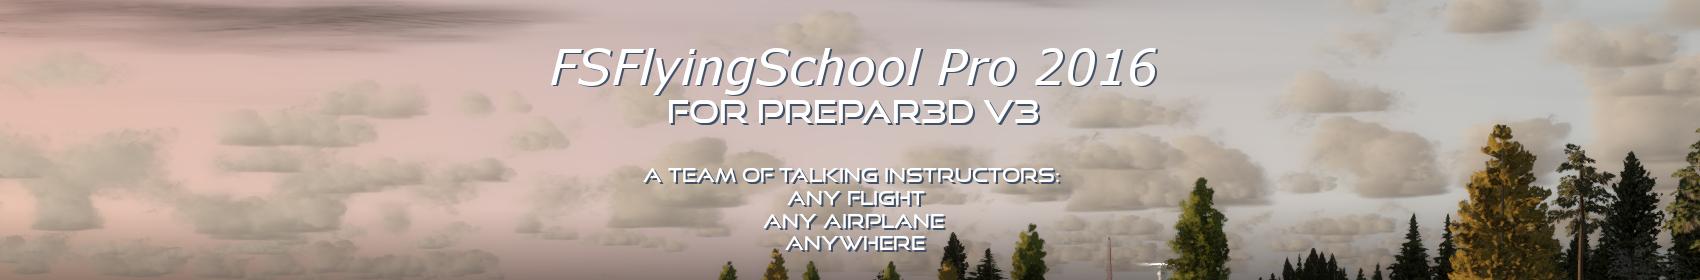 fsflyingschool_banner